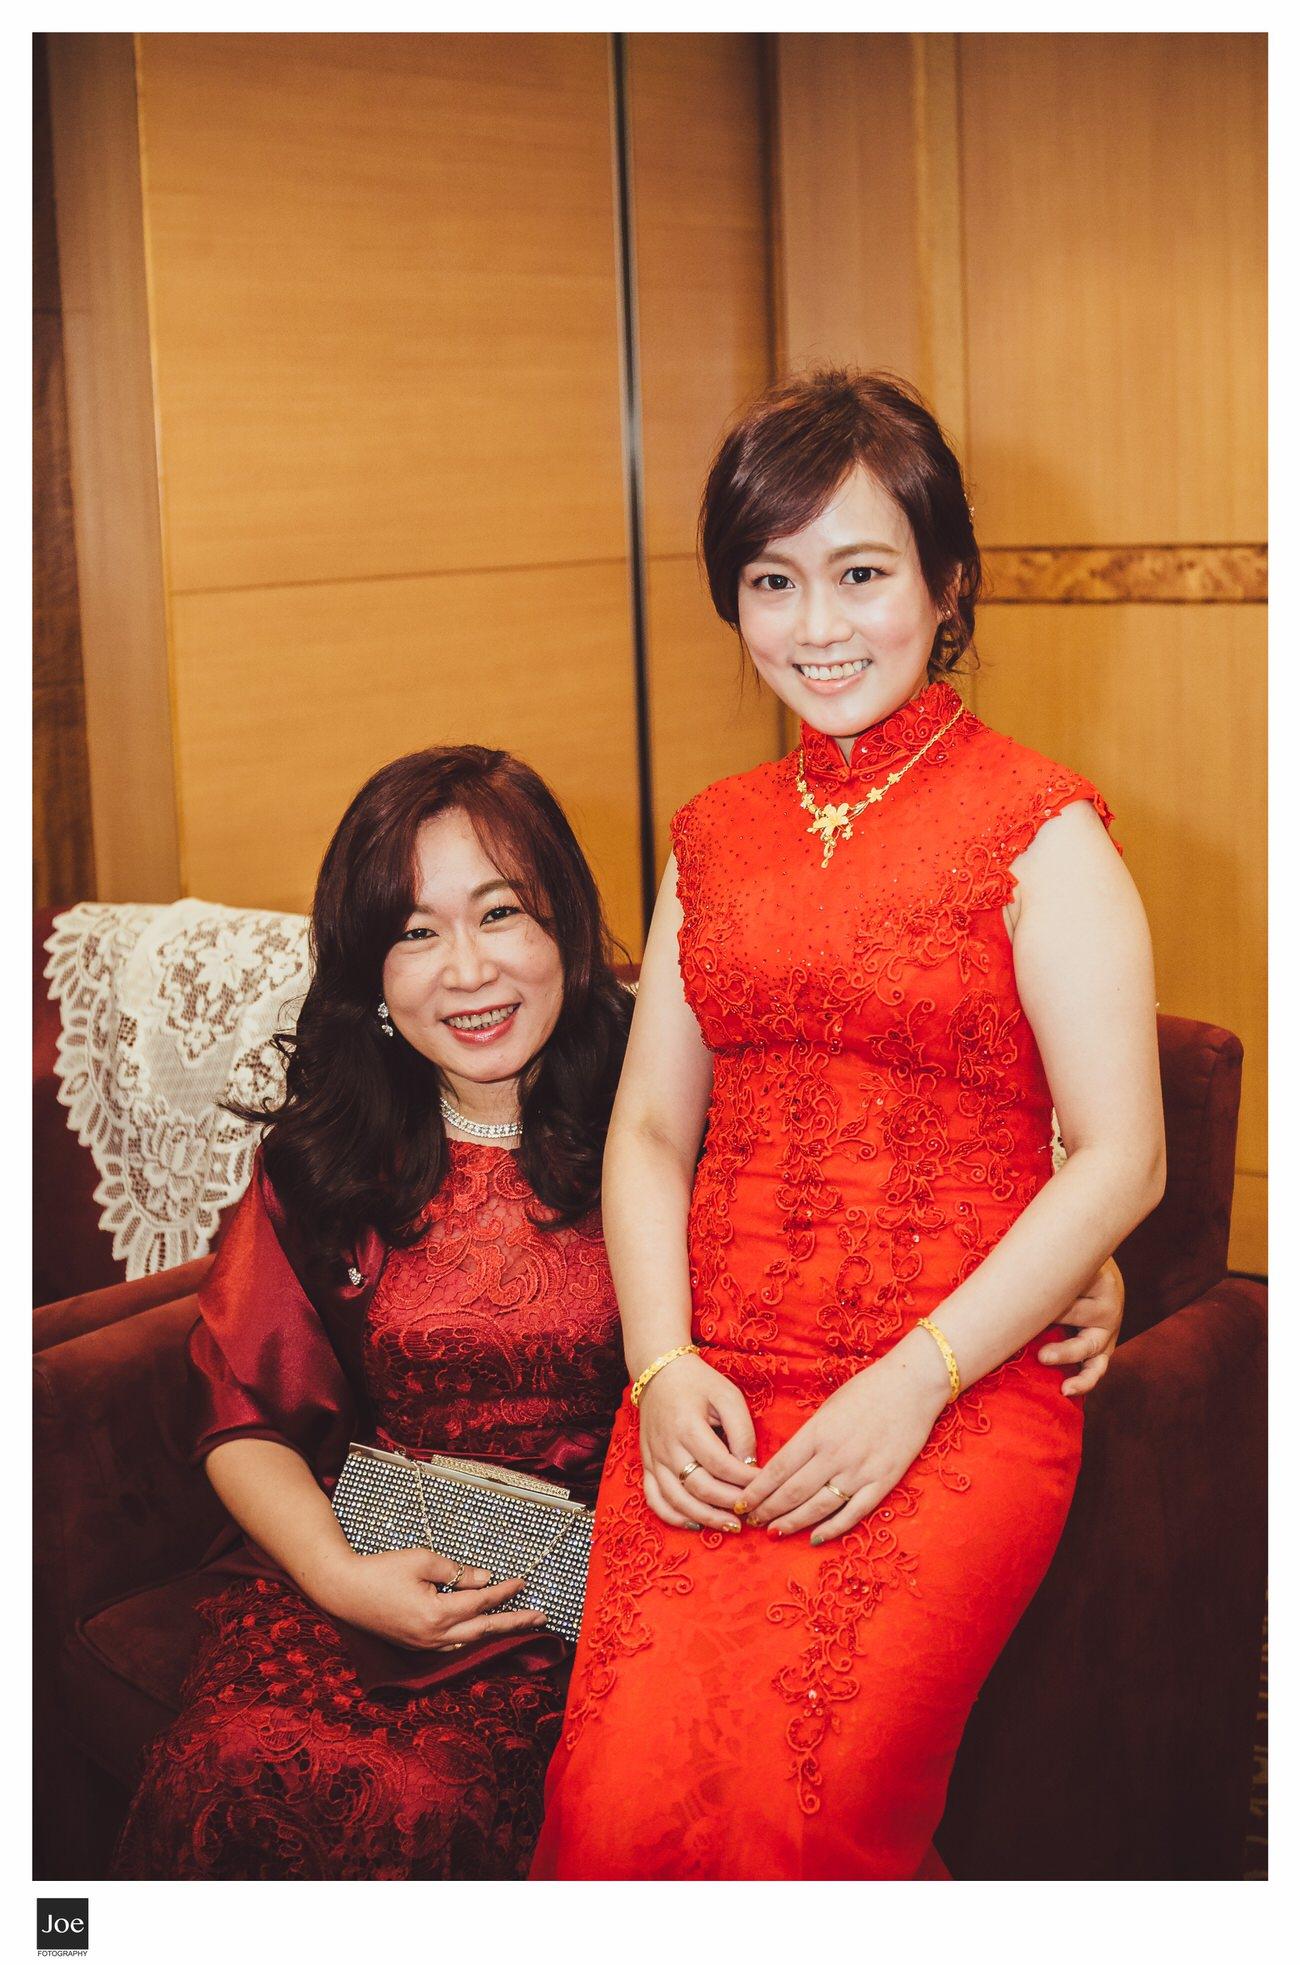 sunworld-dynasty-hotel-taipei-wedding-photo-joe-fotography-angel-jay-007.jpg